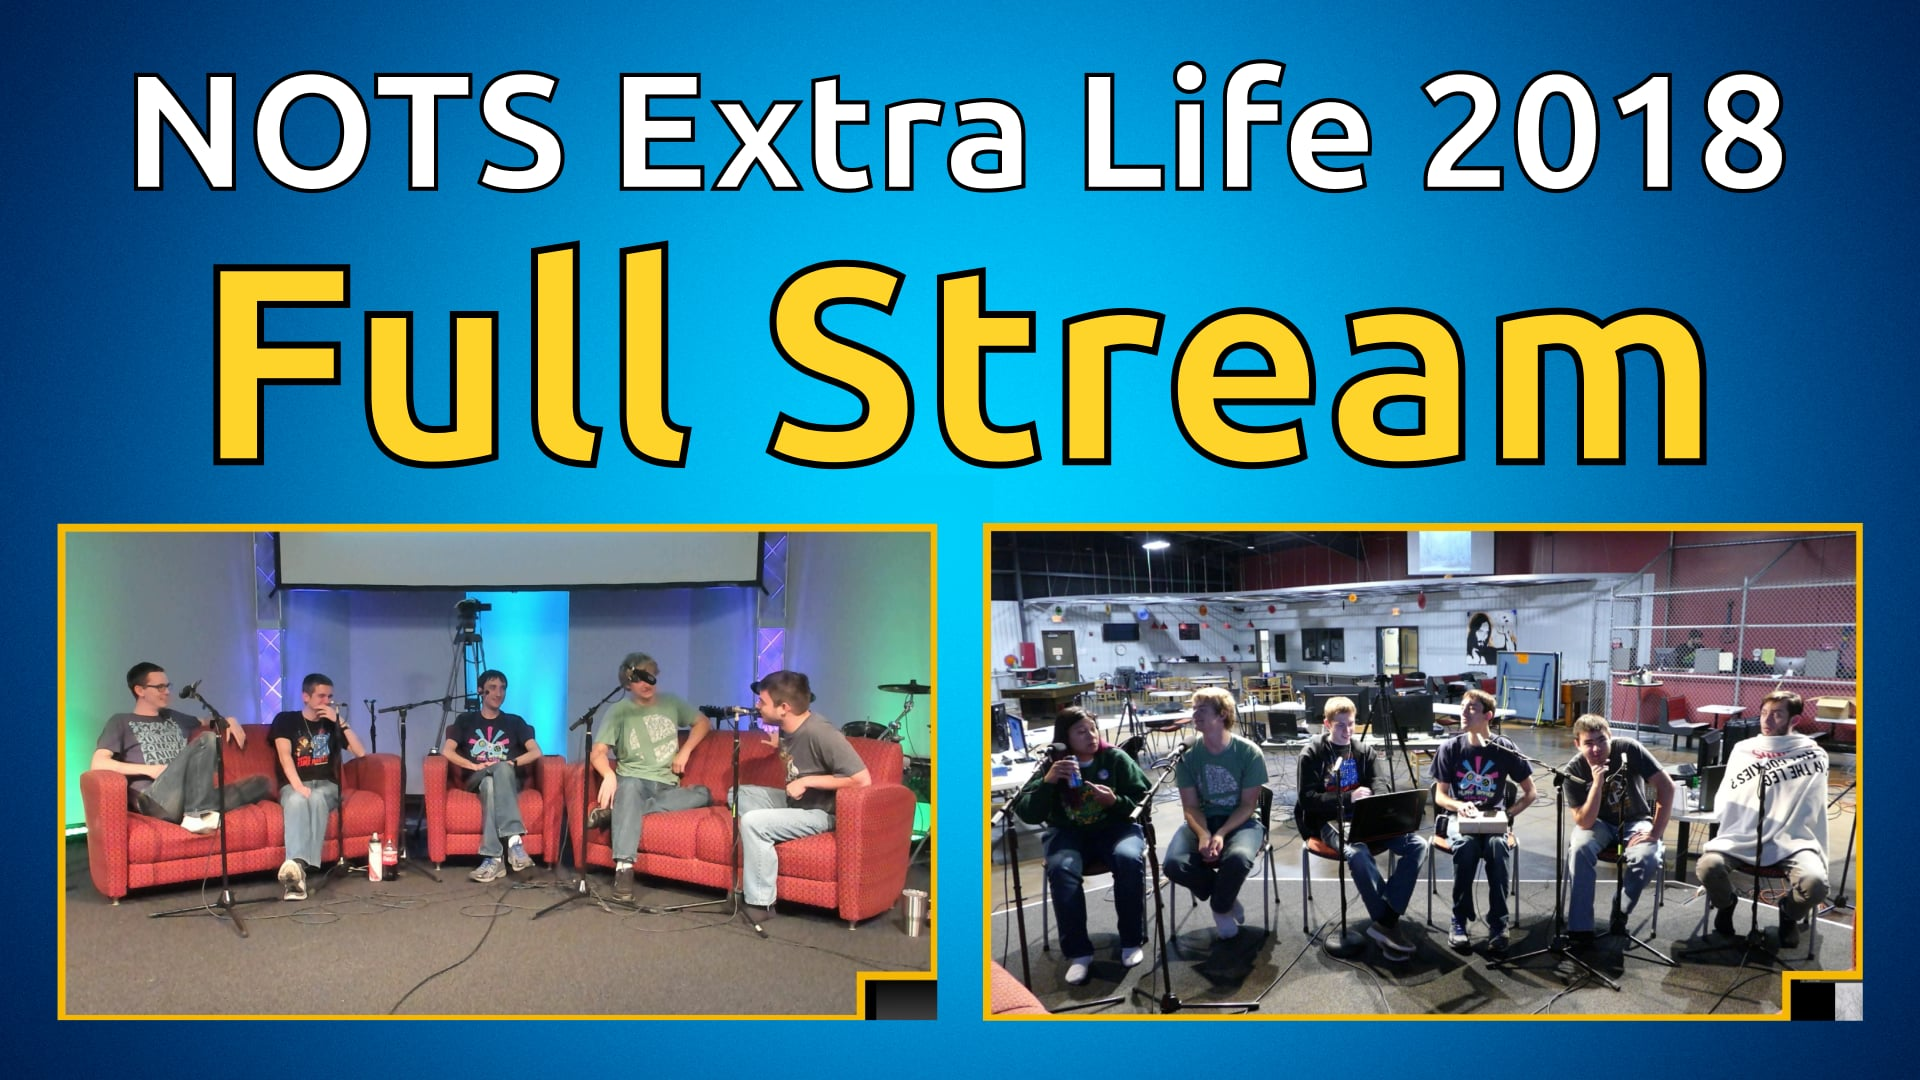 NOTS Extra Life 2018 - Full Stream (Part 3 of 3)